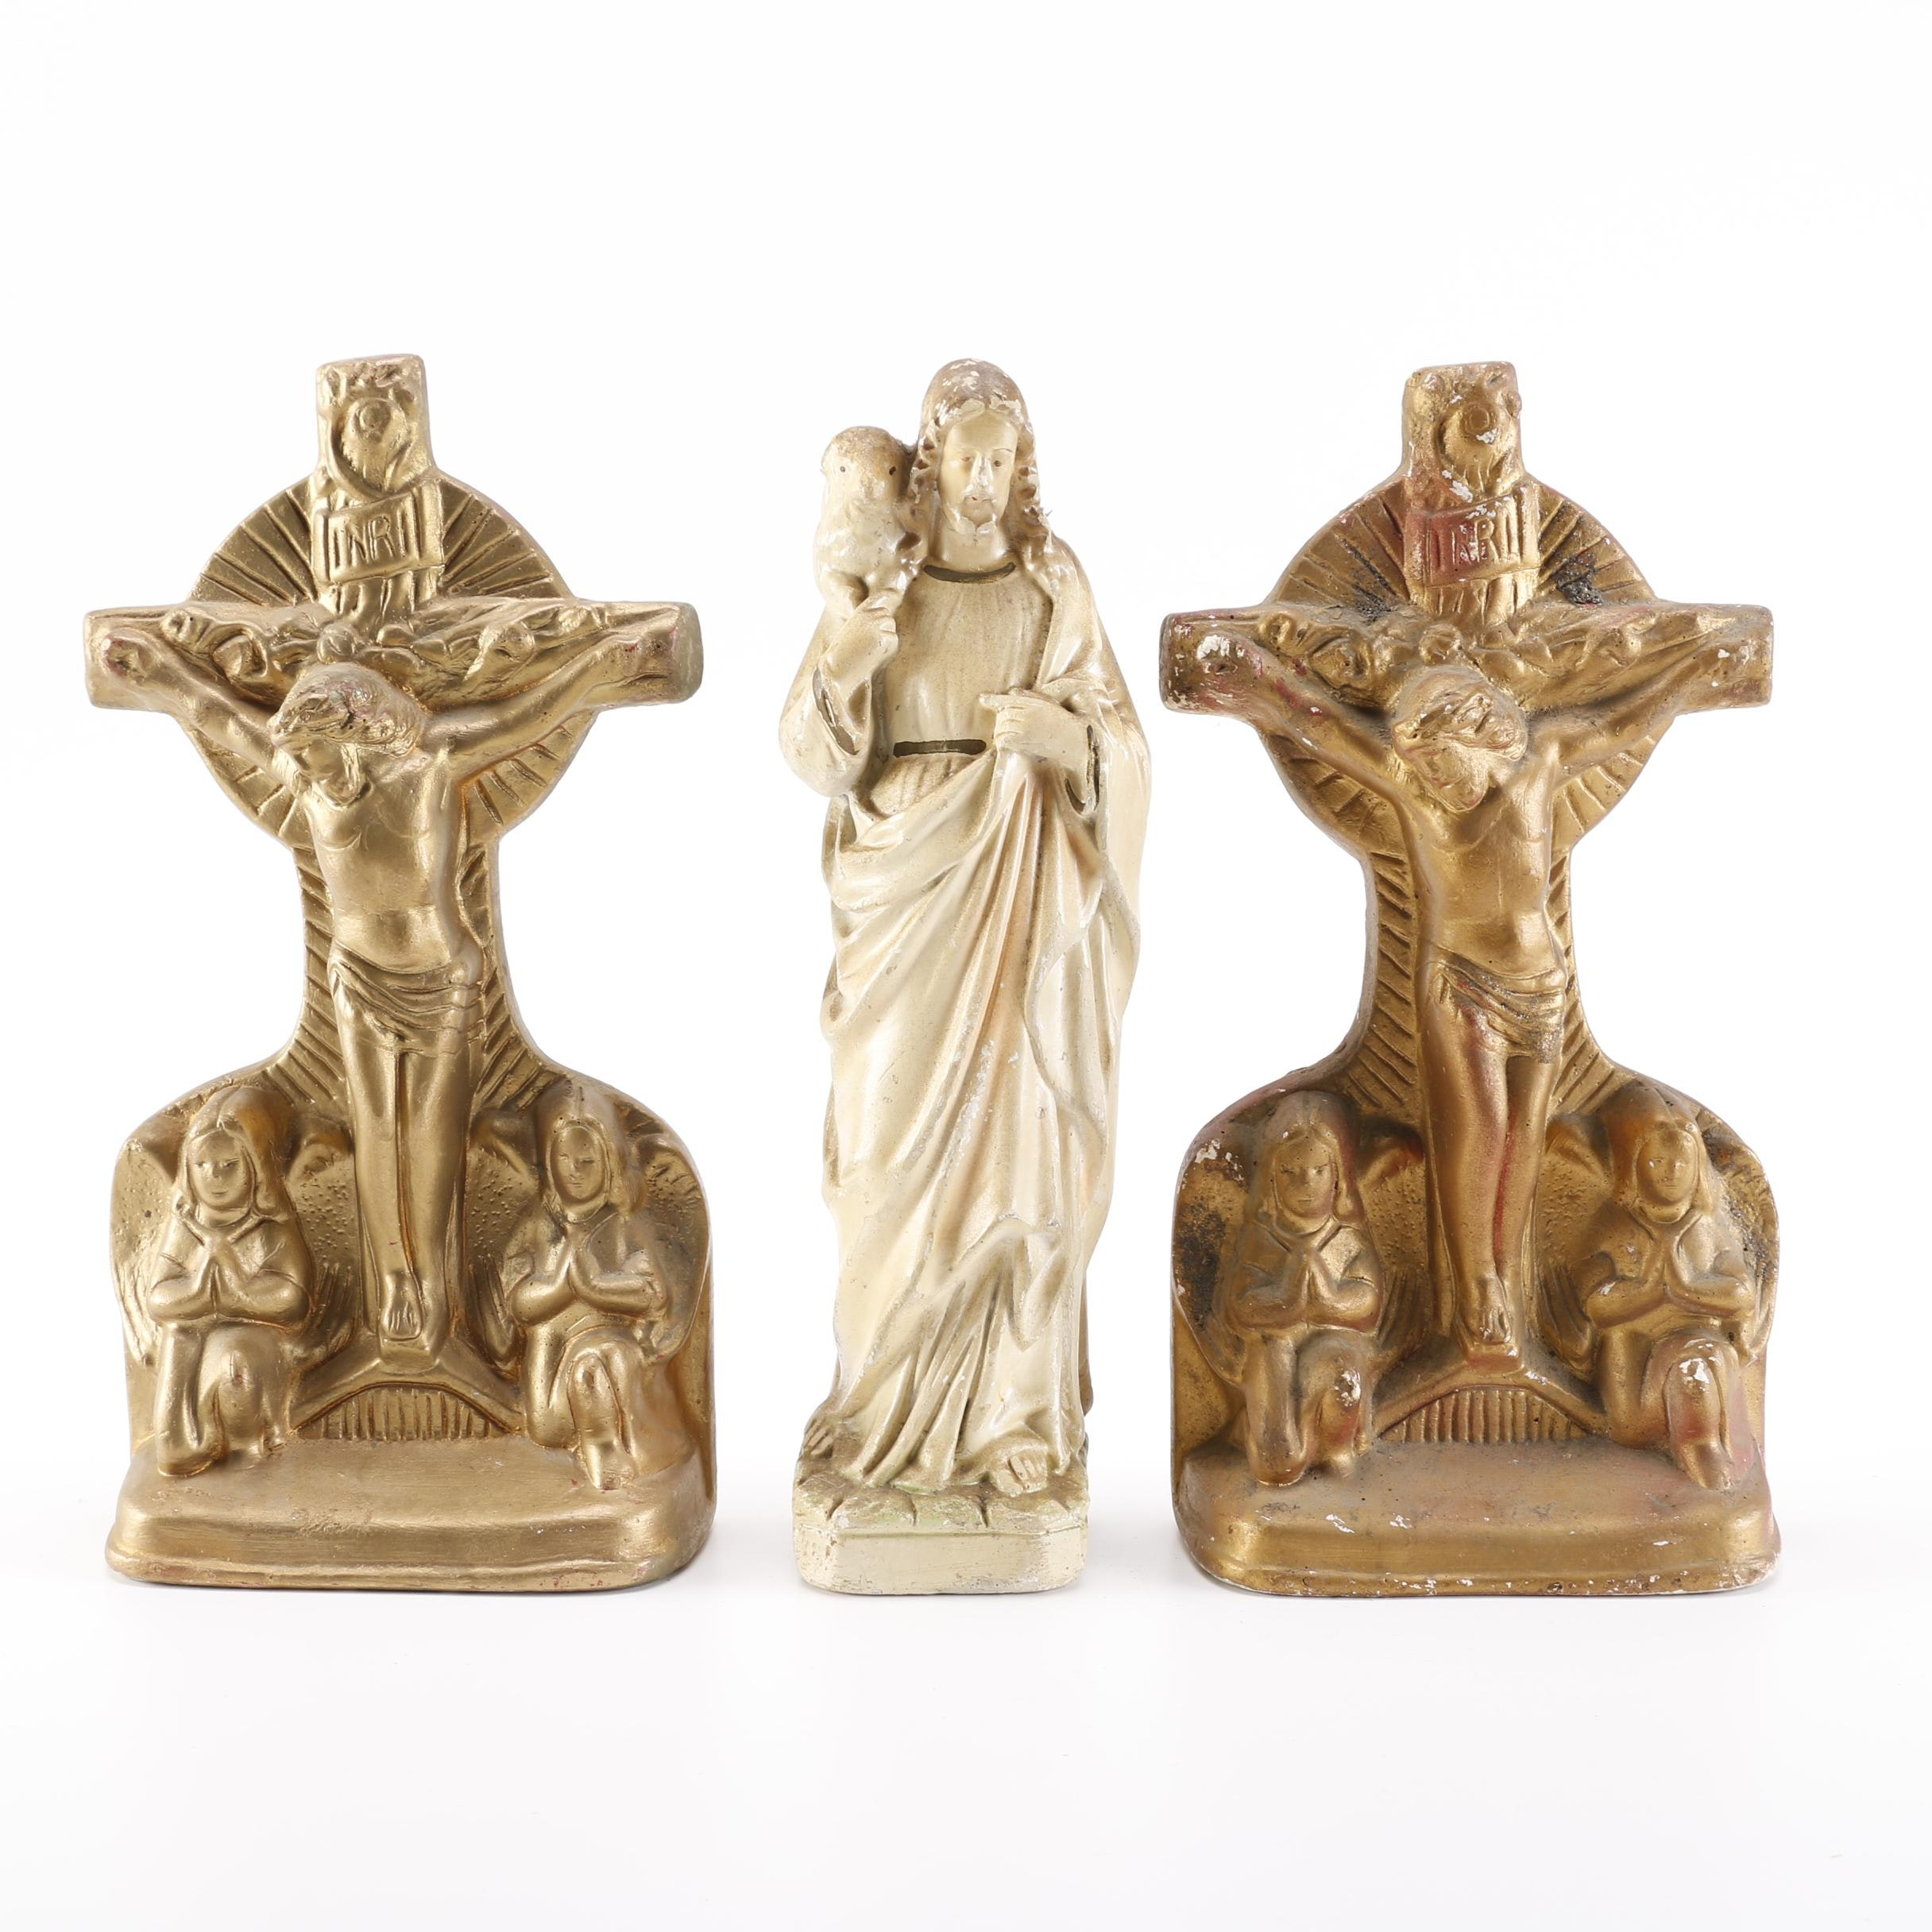 Jesus Christ Ceramic Figurine and Crucifix Bookends